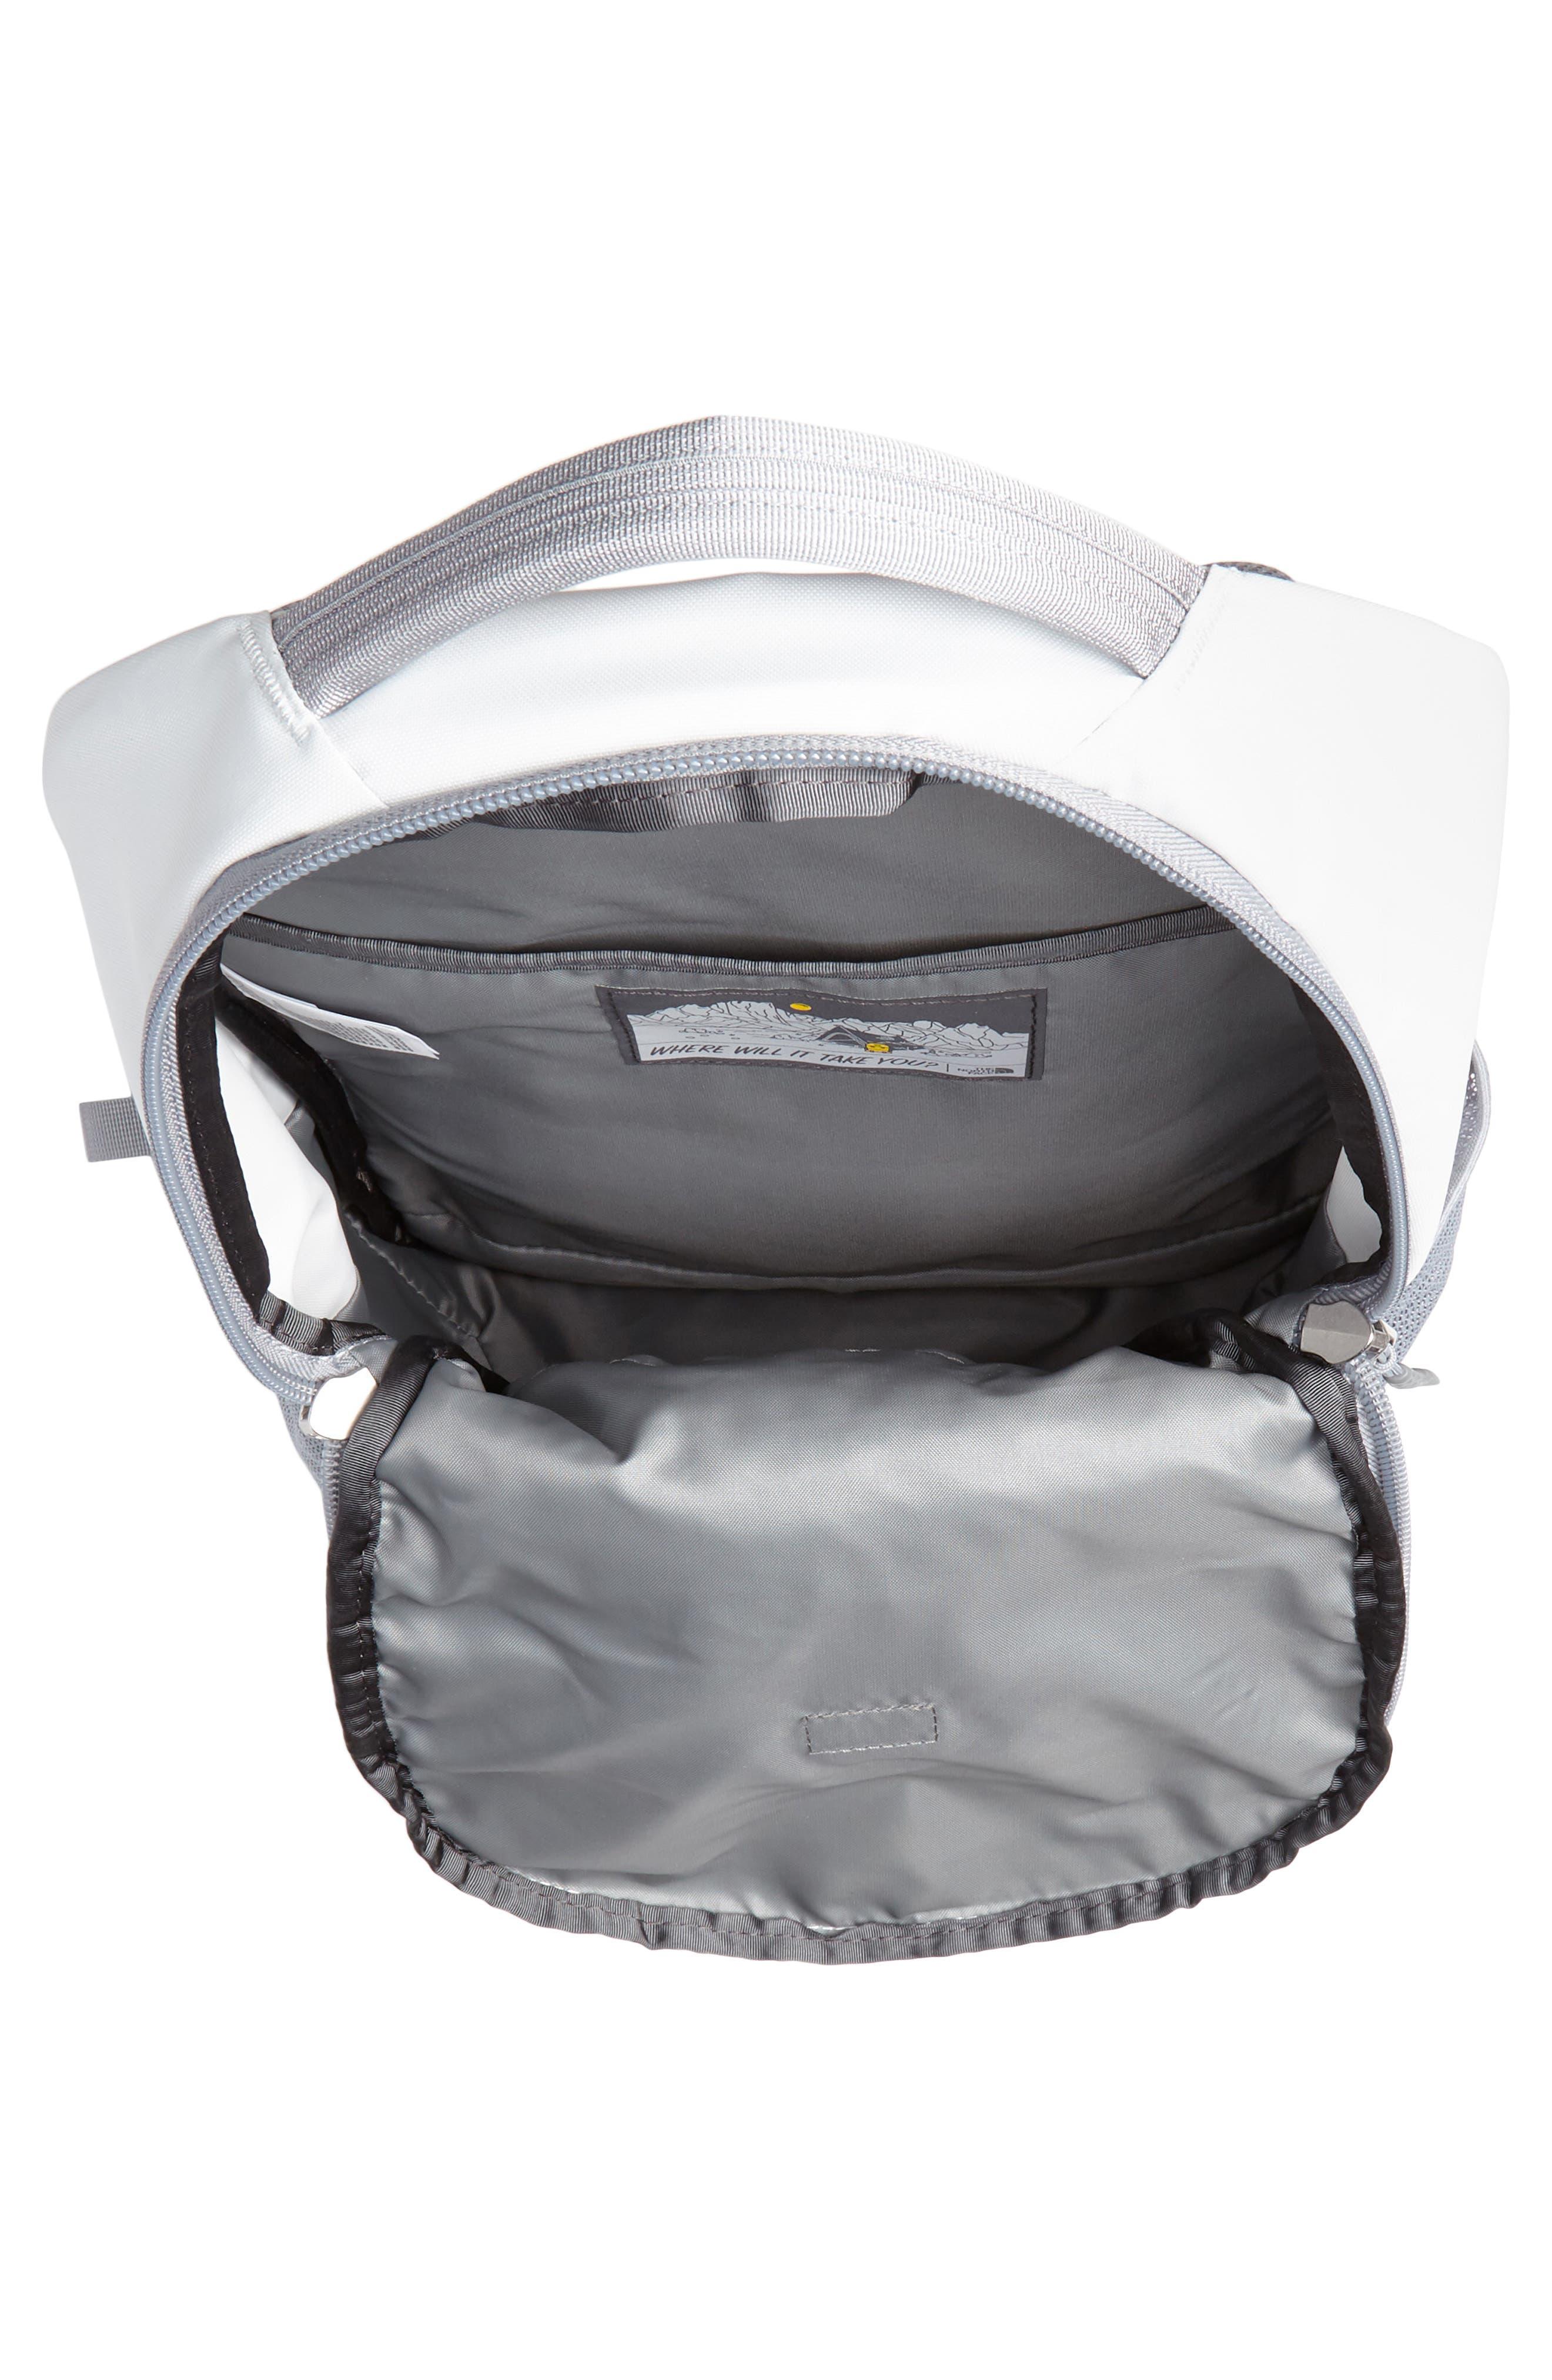 Vault Backpack,                             Alternate thumbnail 4, color,                             Tin Grey/ Mid Grey